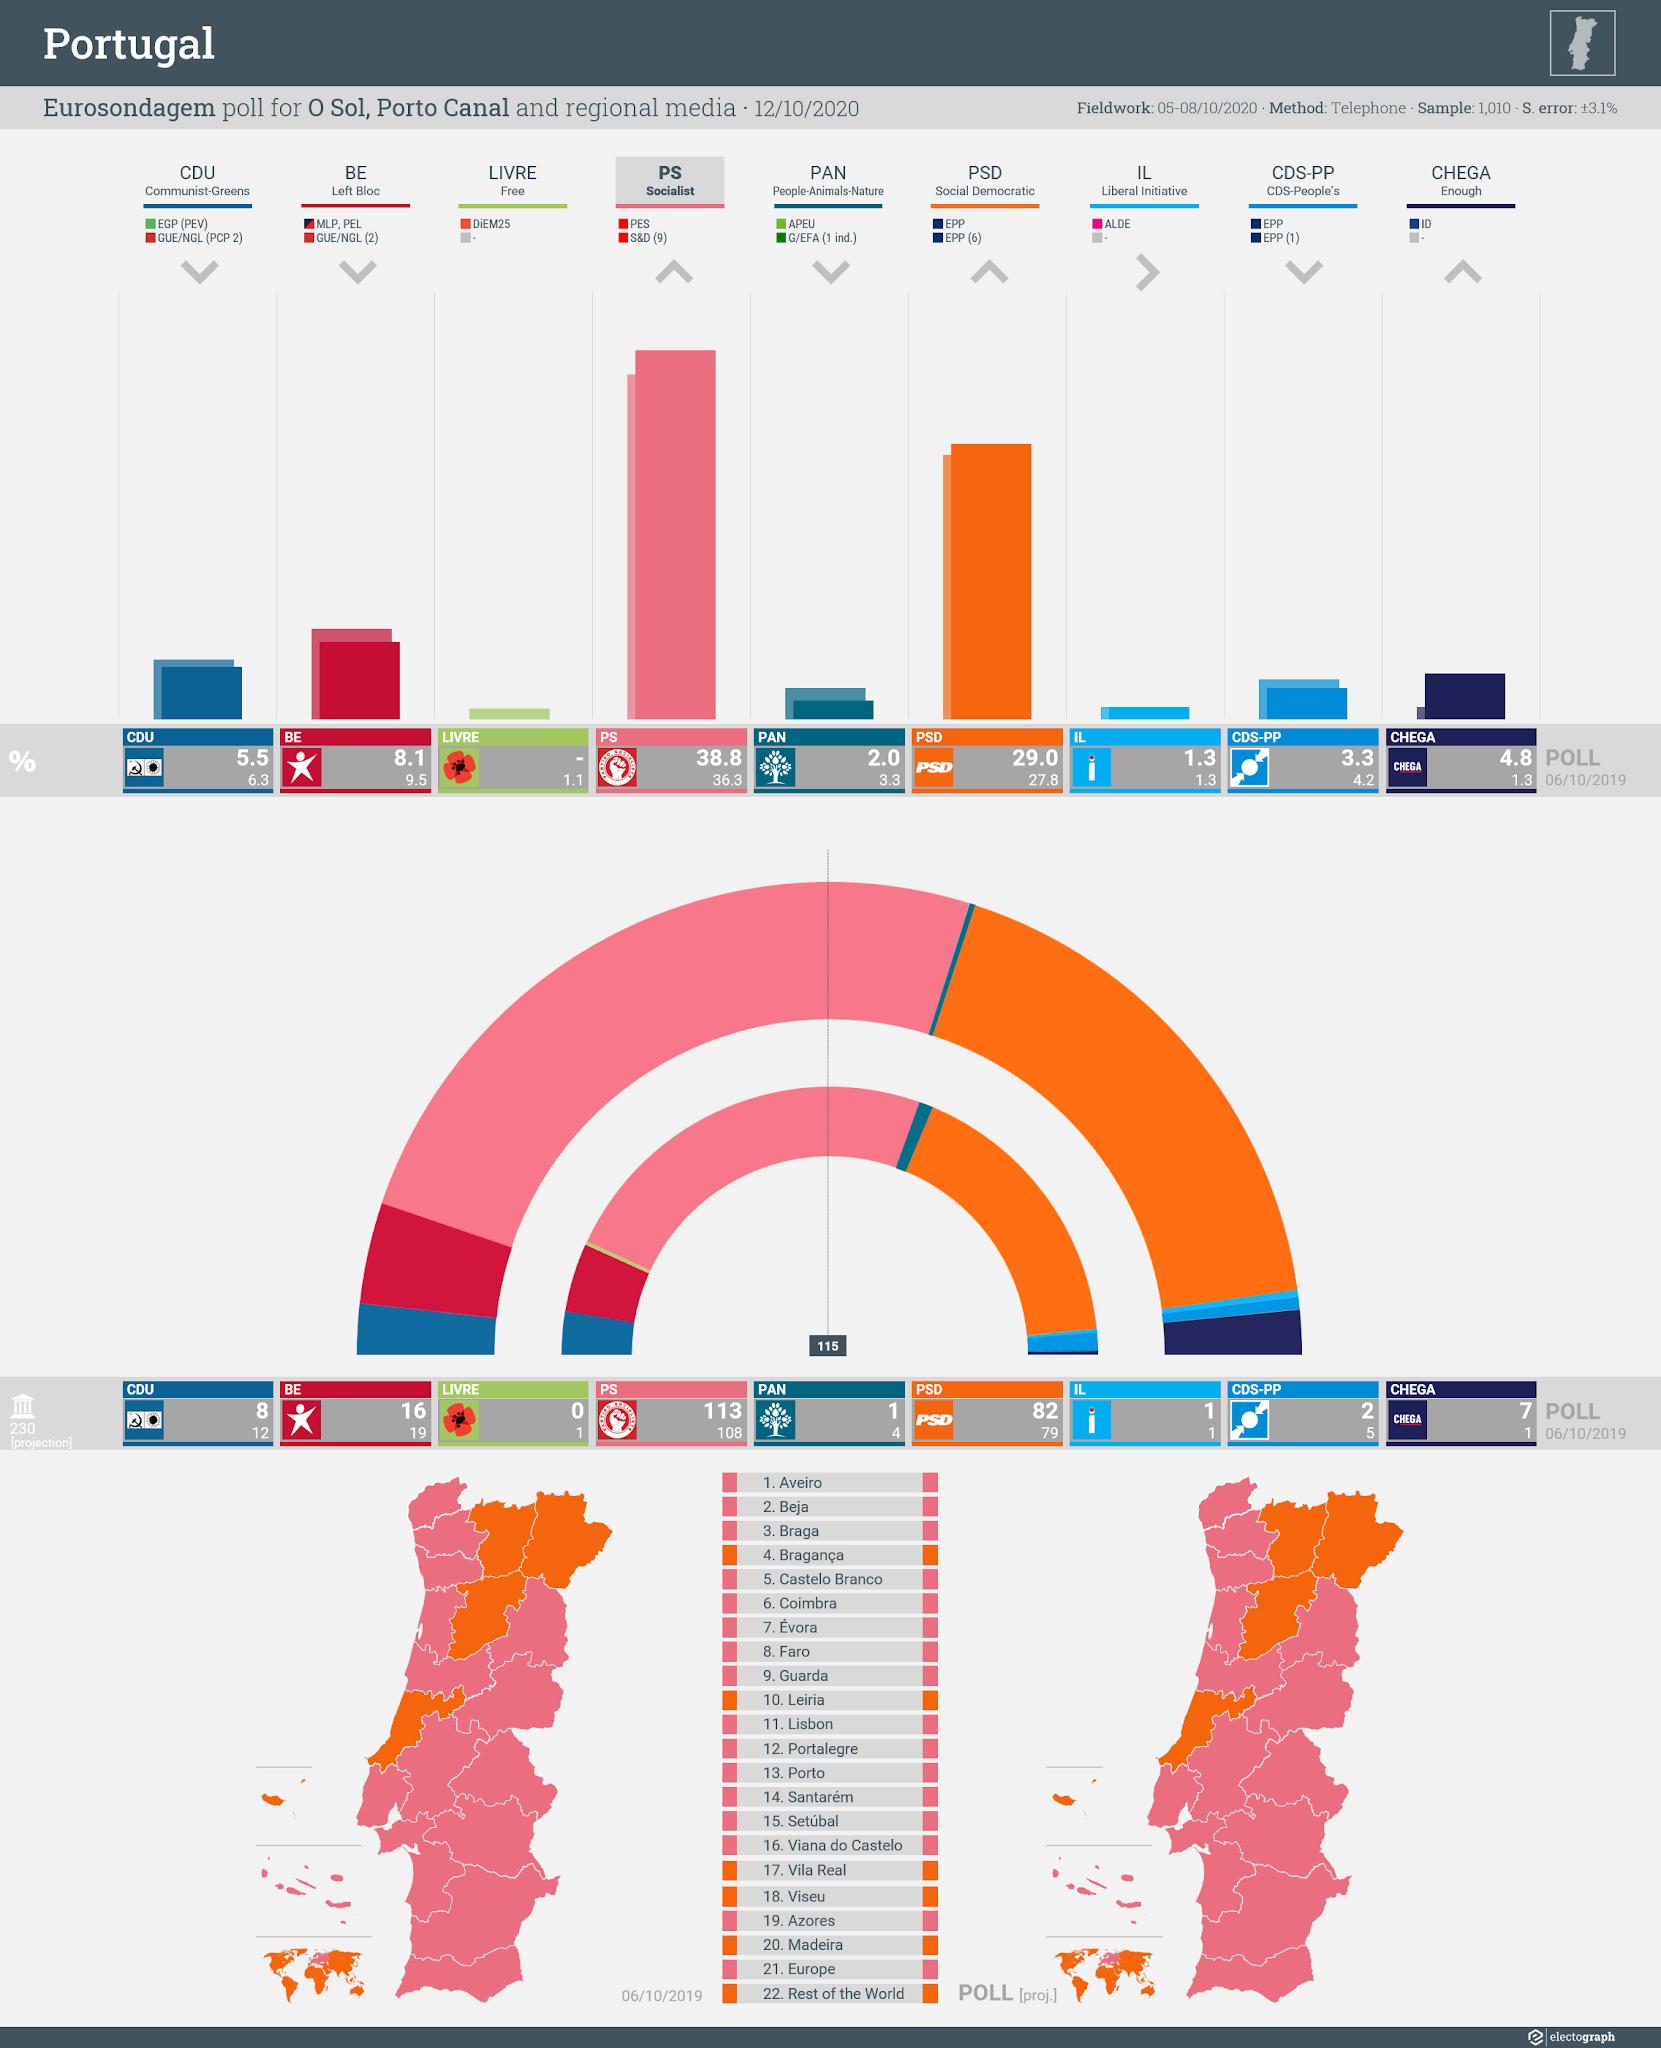 PORTUGAL: Eurosondagem poll chart for Sol and Porto Canal, 12 October 2020